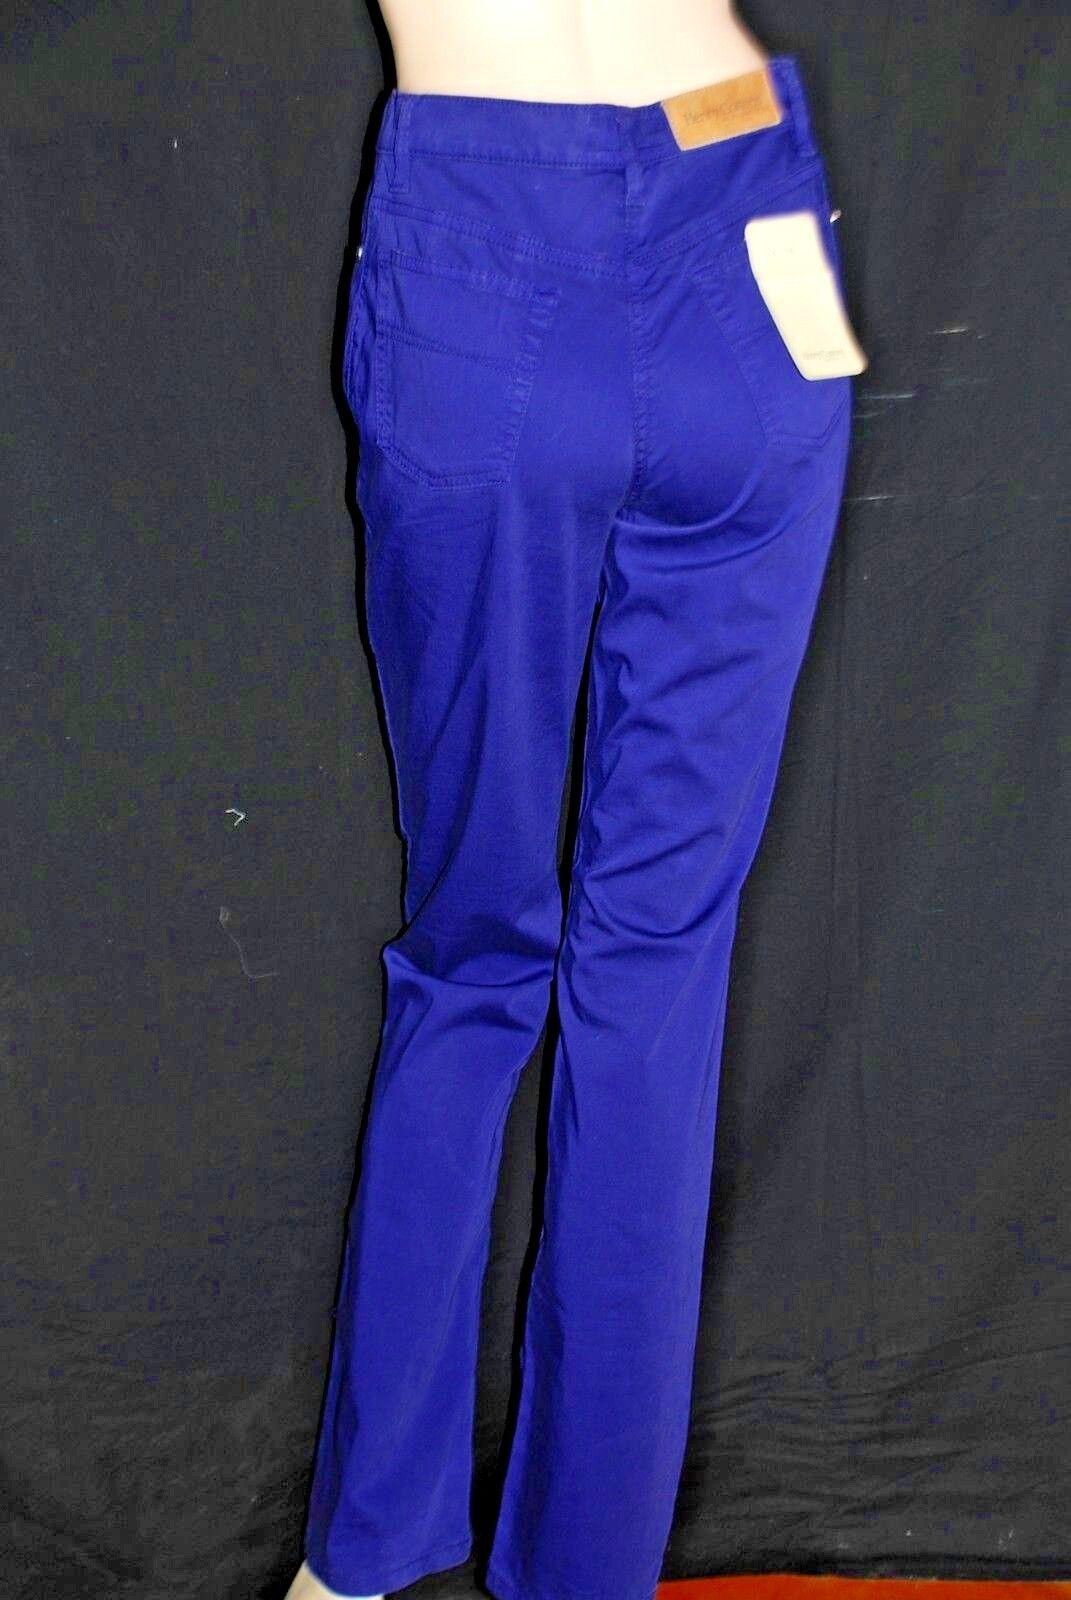 NEU   original HENRY COTTONS Hose Jeans trousers straight leg W27 neu  NEW